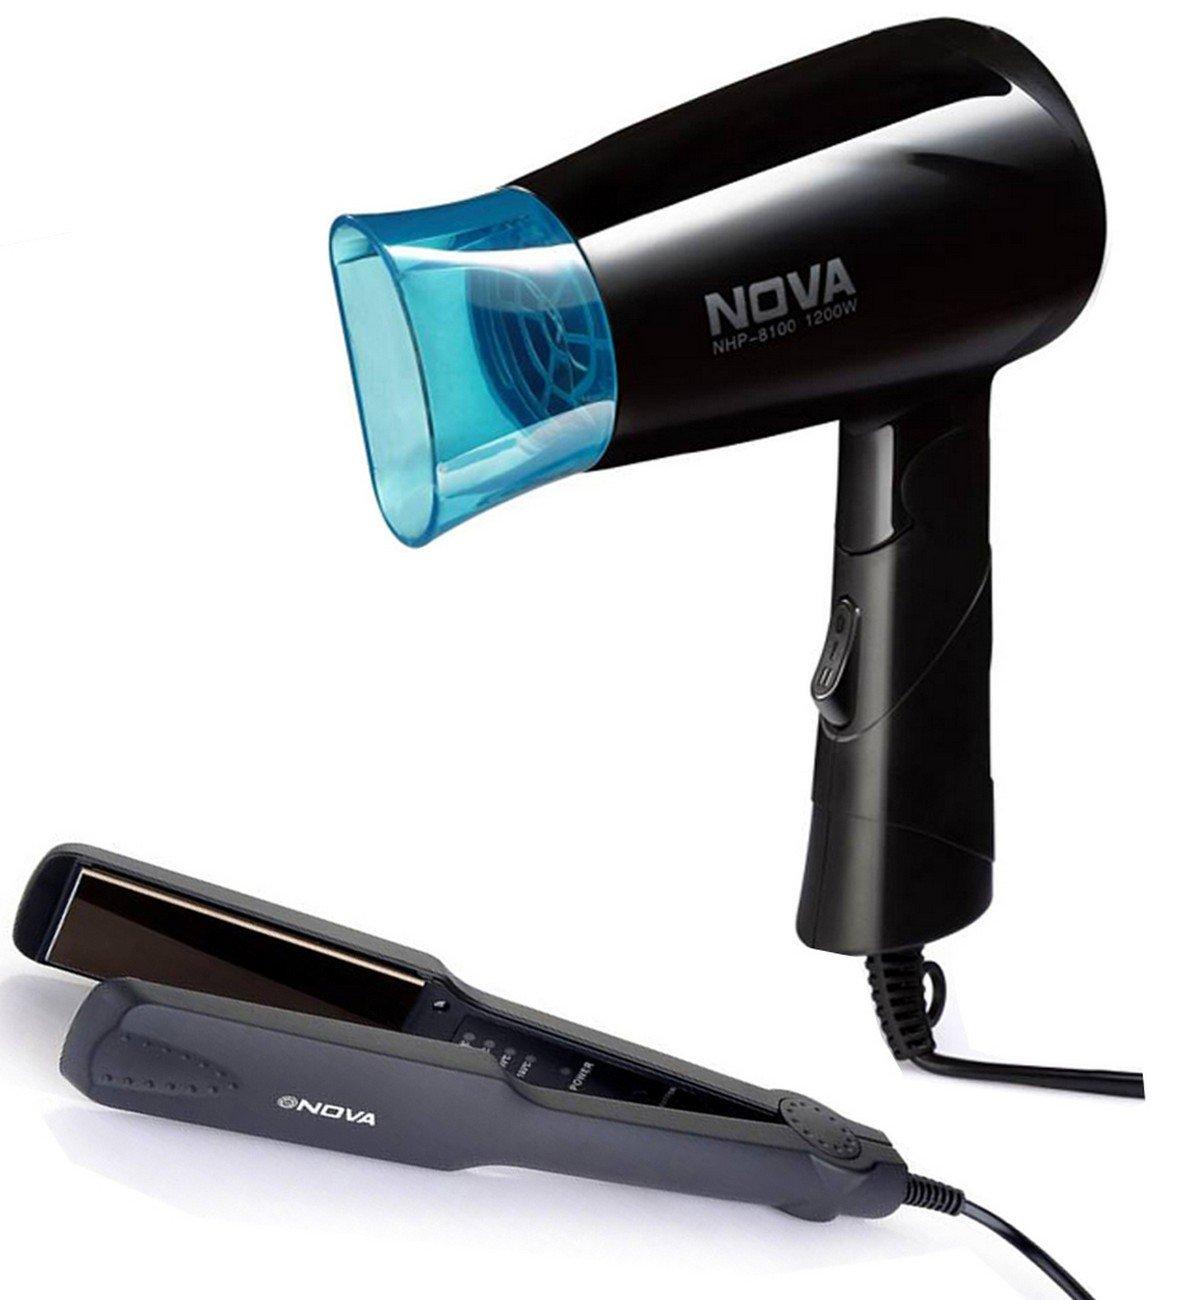 Nova Miss Freshers Combo Kit, Hair Straightener and Hair